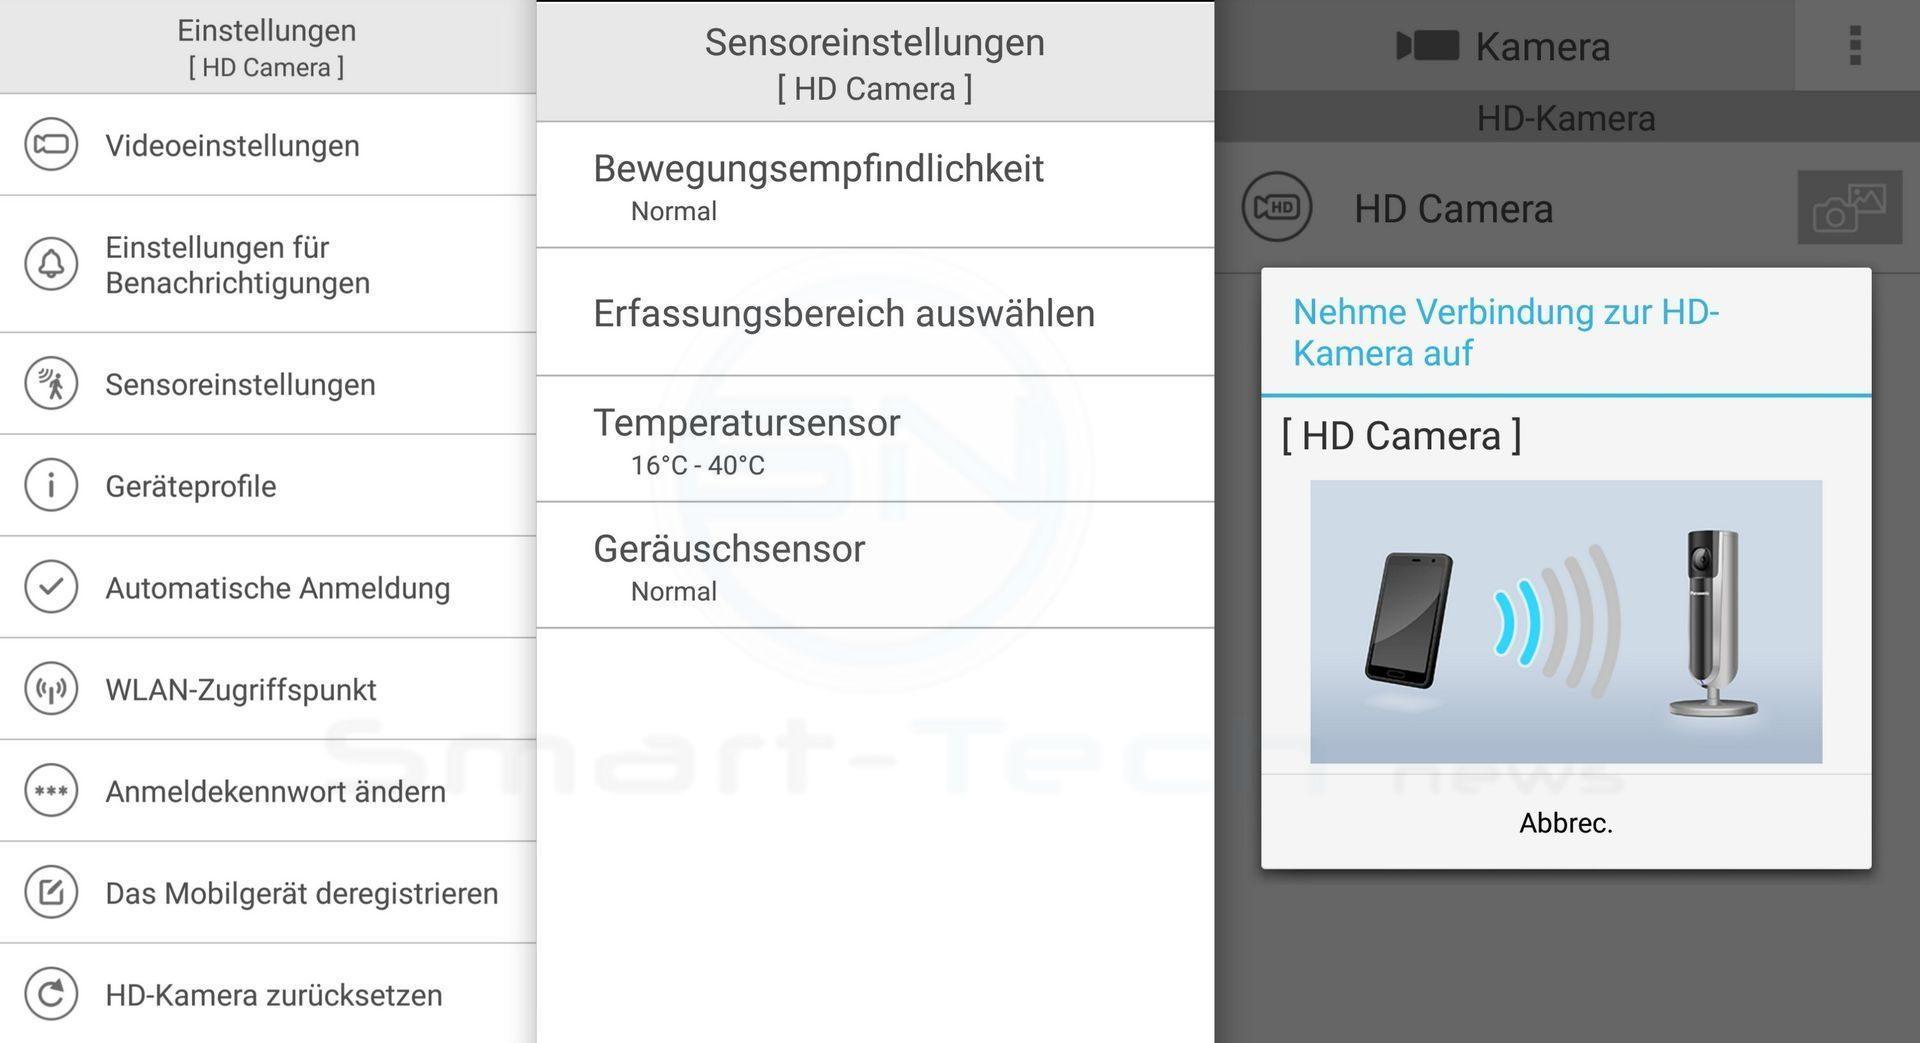 Überwachung - Panasonic SmartHome KX-HNC800 Full HD Kamera - SmartTechNews